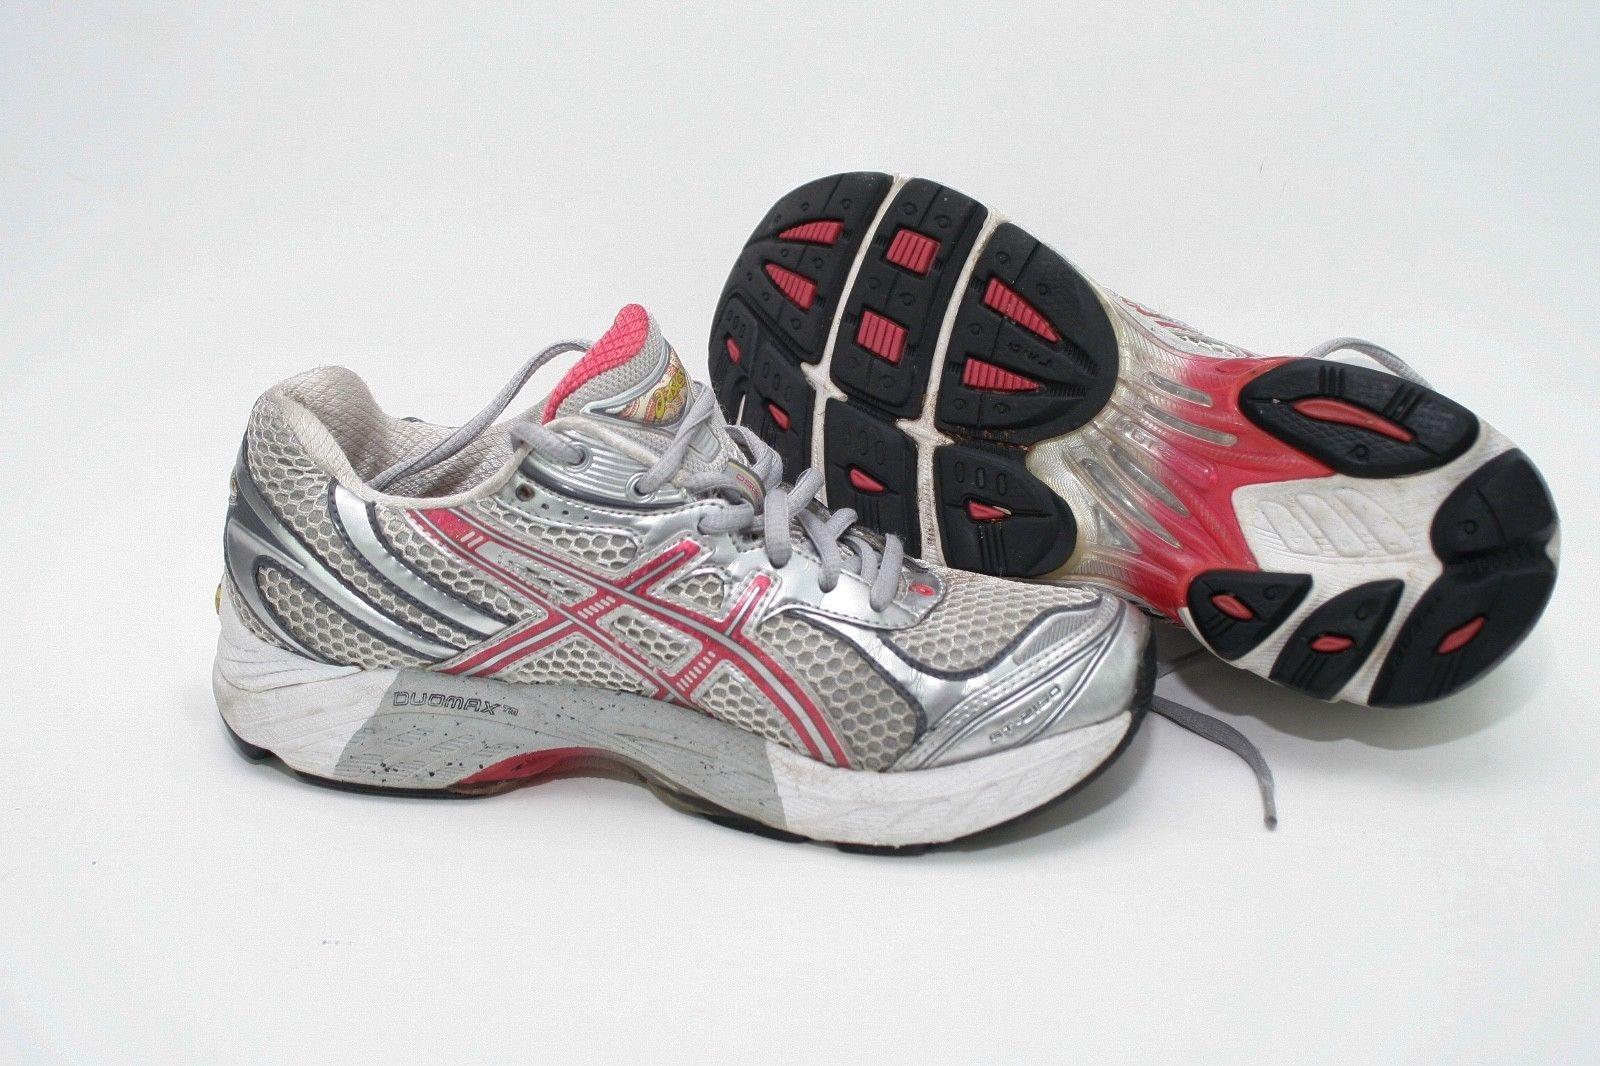 Chaussures GT de ASICS course ASICS GEL 12917 GT 2150 et 50 articles similaires 26943aa - sbsgrp.website